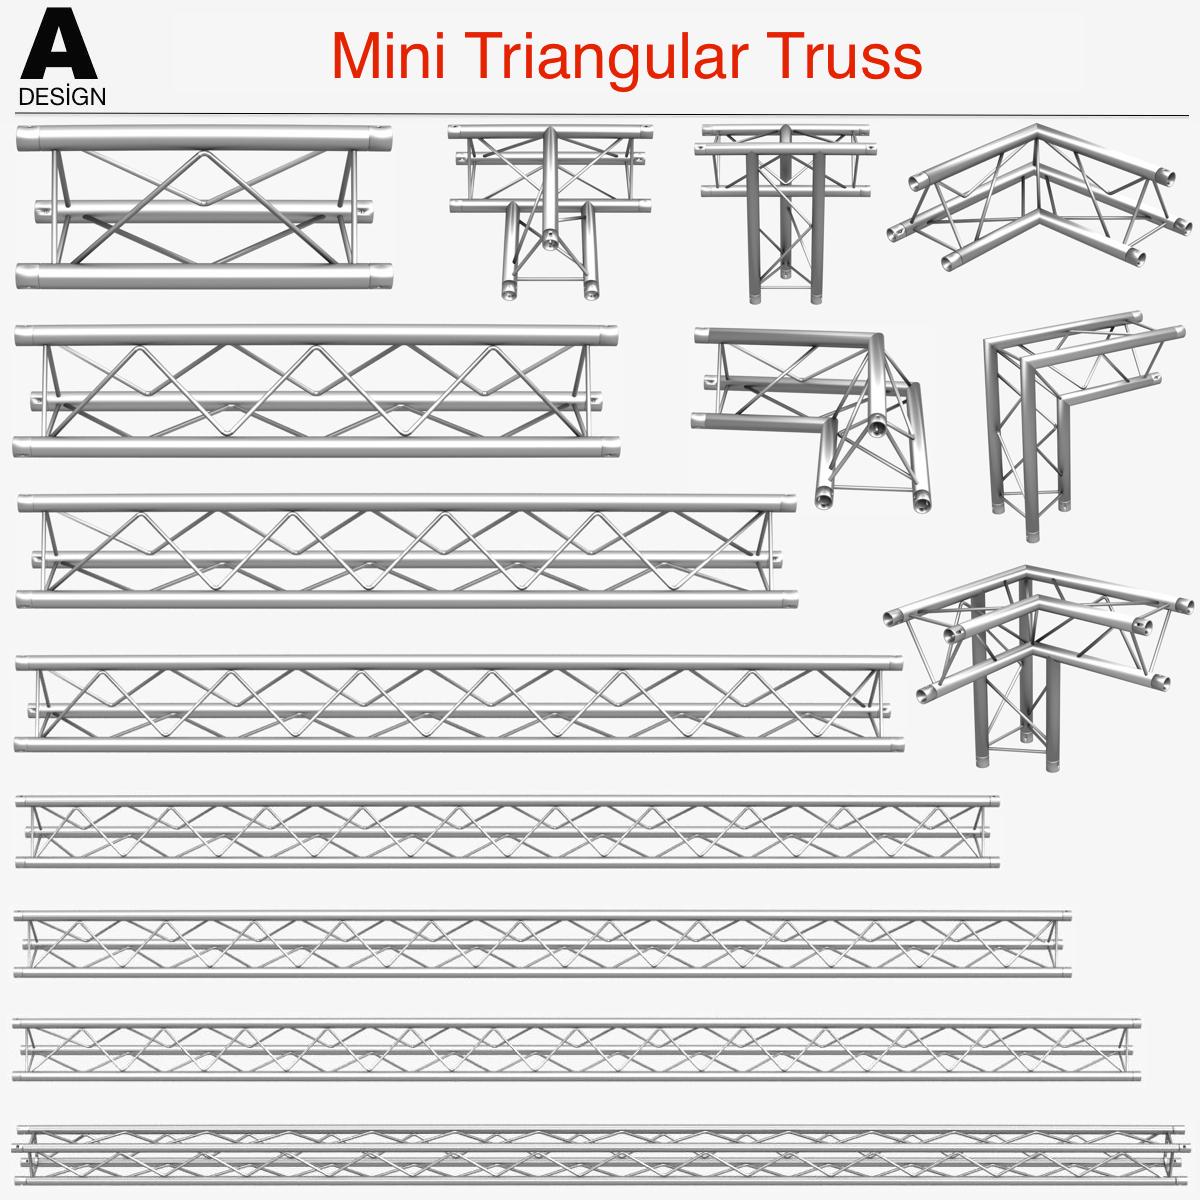 Mini Triangular Truss (Collection 14 Modular) 3d model 3ds max dxf fbx c4d Collada dae  obj 268655